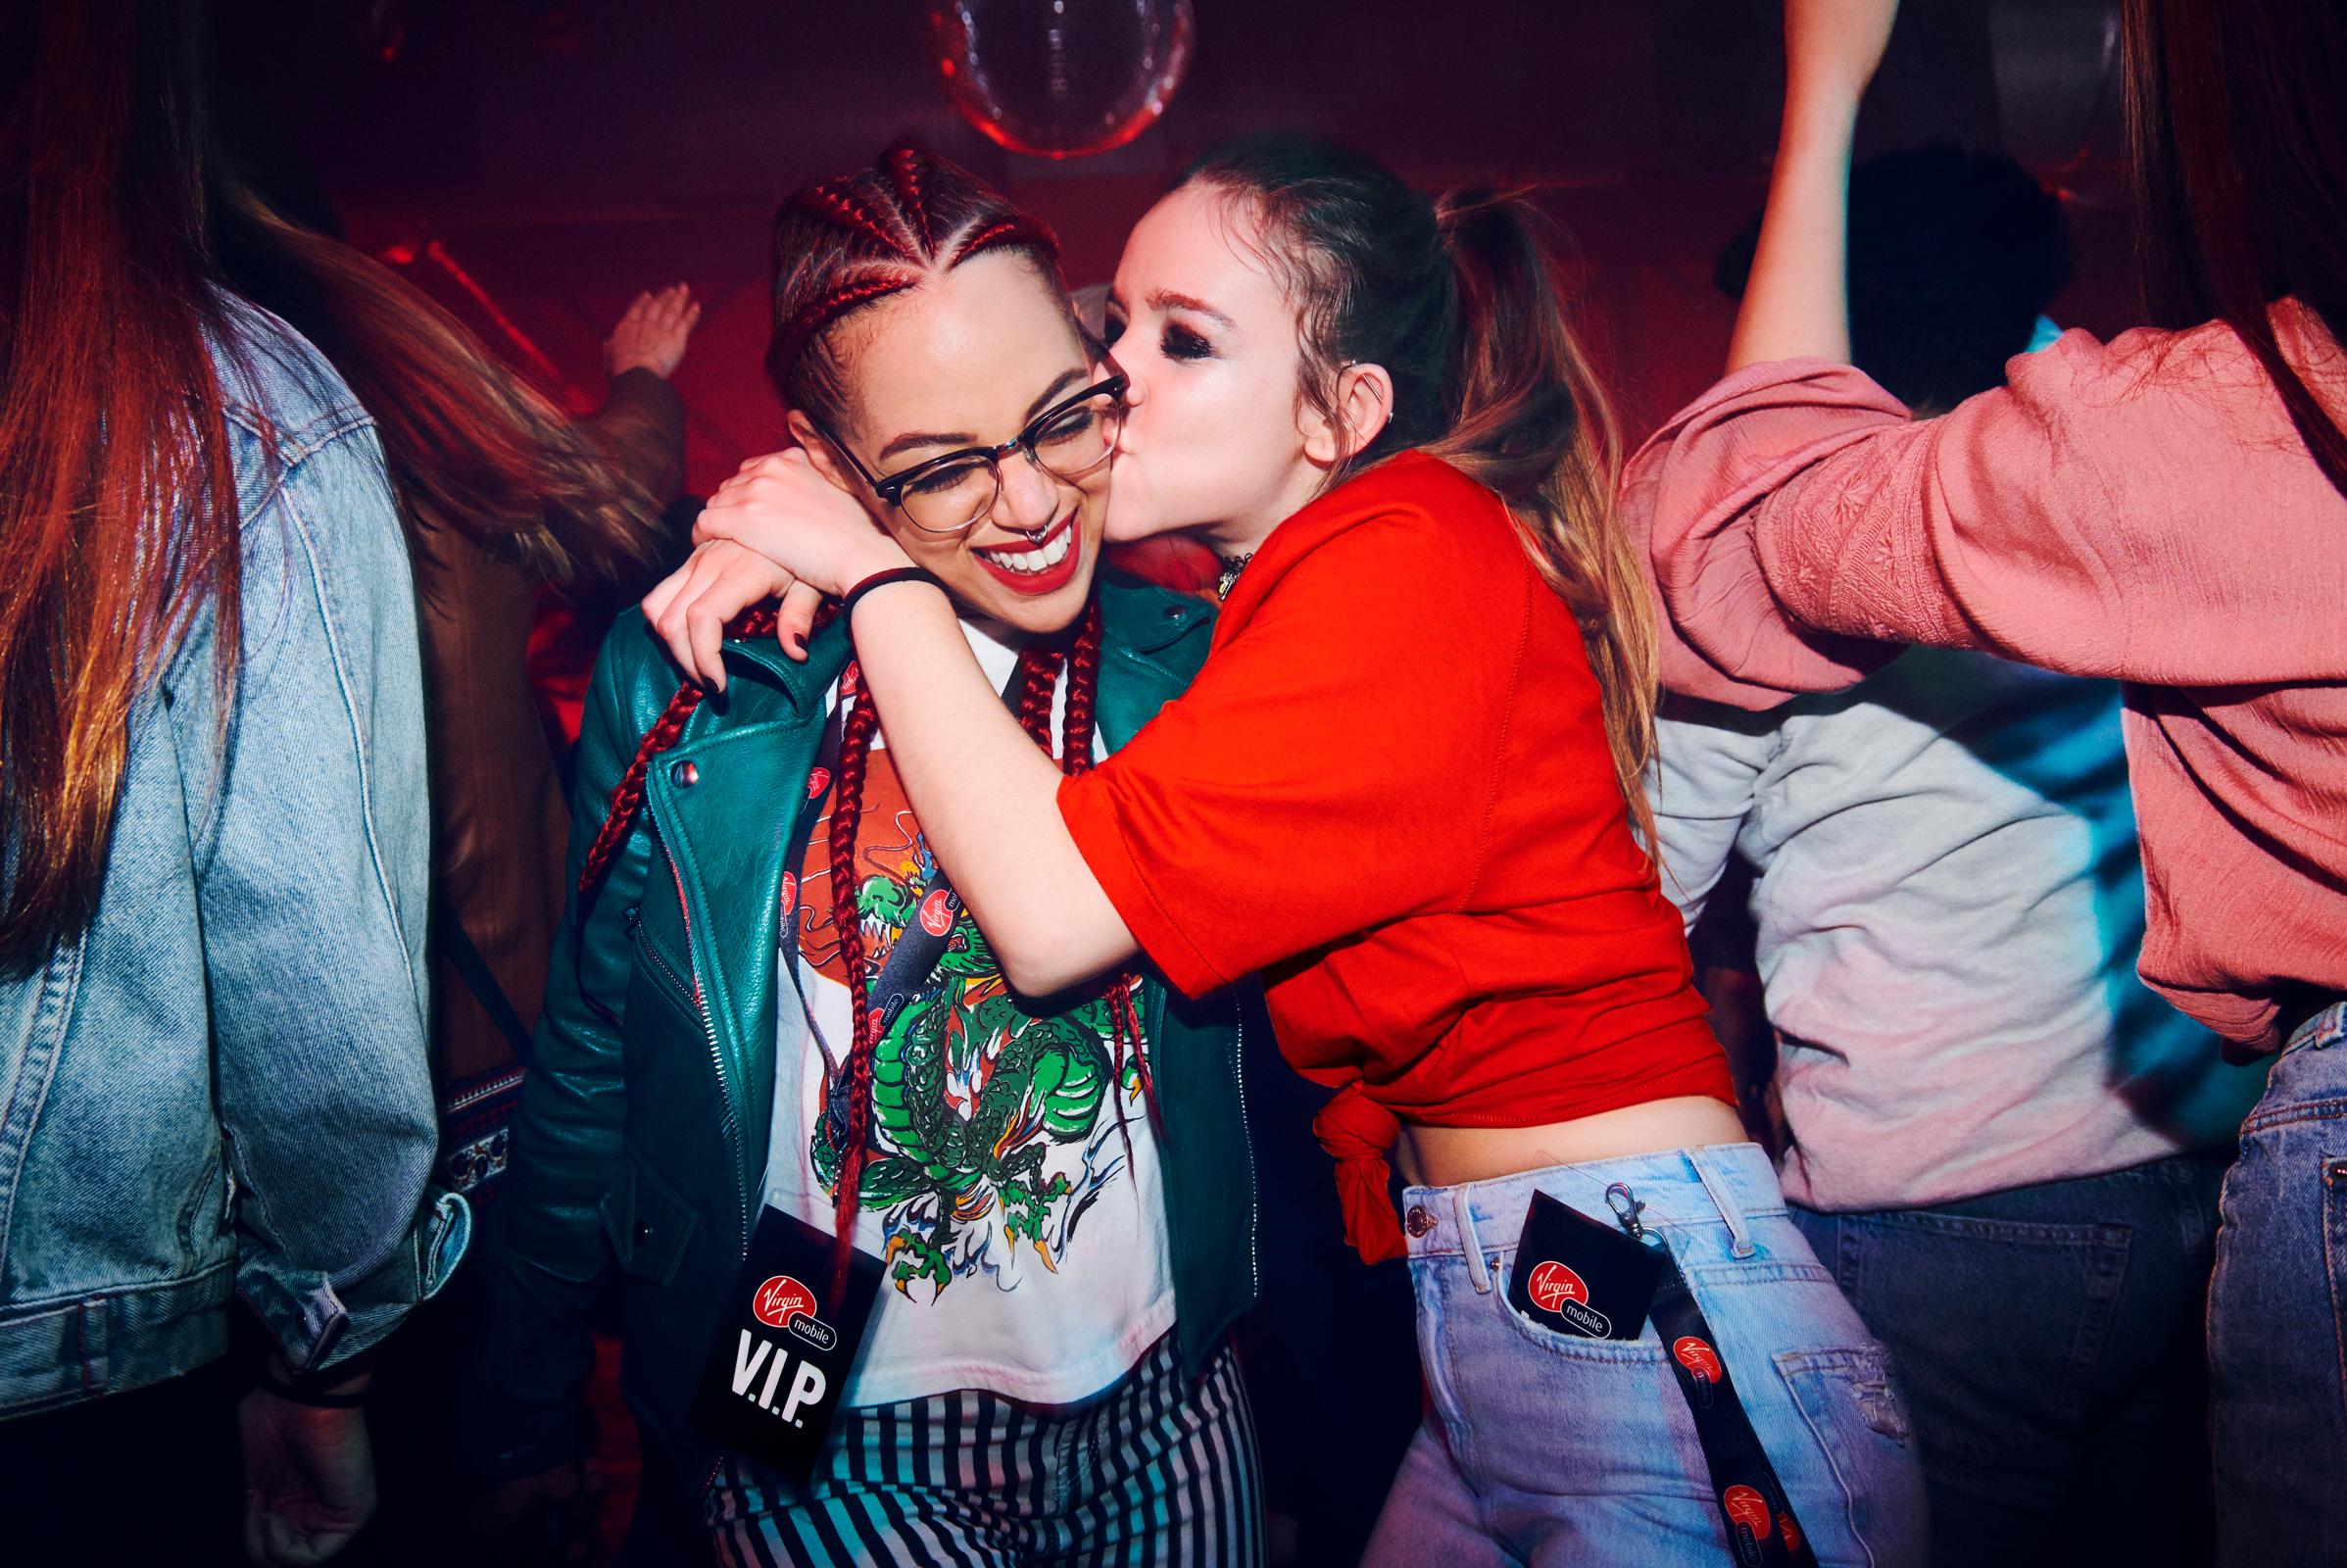 VIP_Kiss_horiz_RGB.jpg